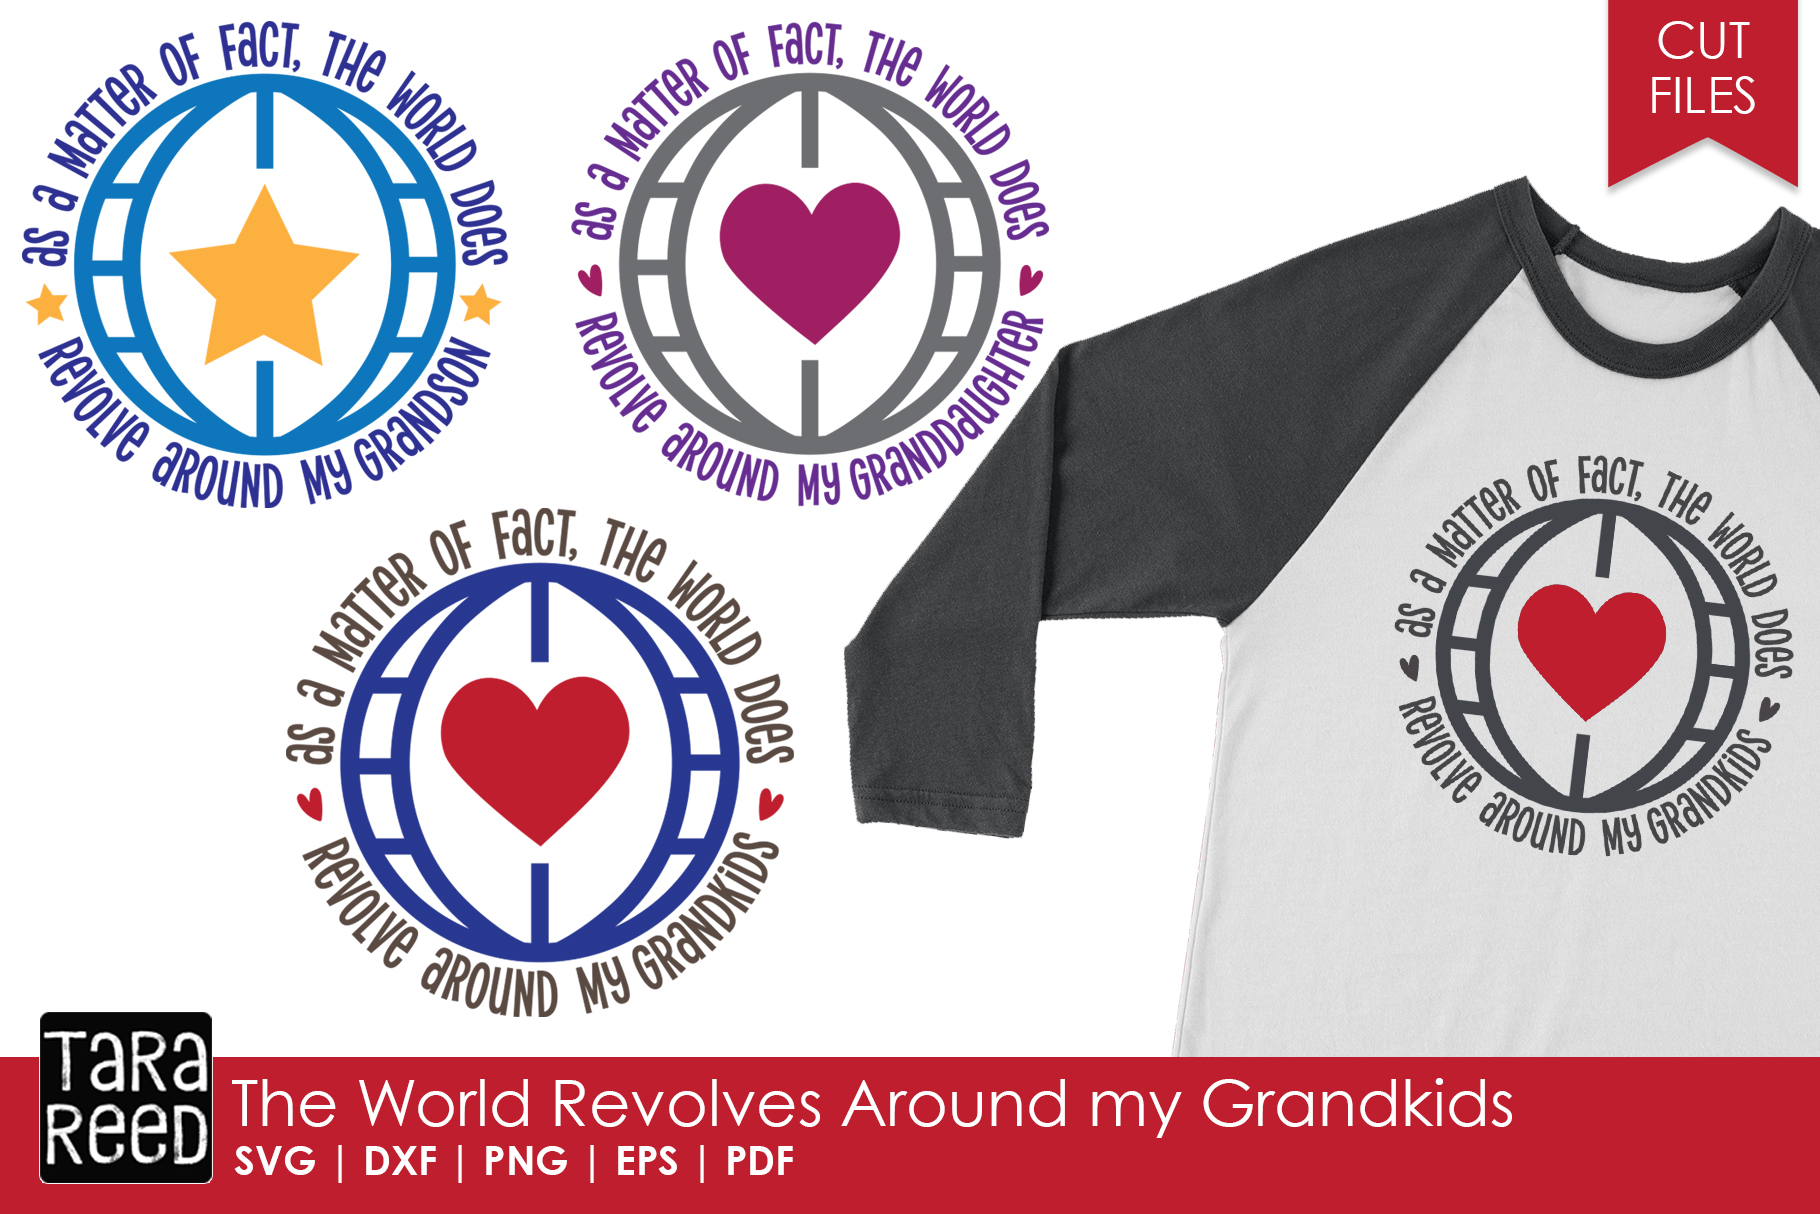 World Revolves Around My Grandkids - Grandparent Cut Files example image 1